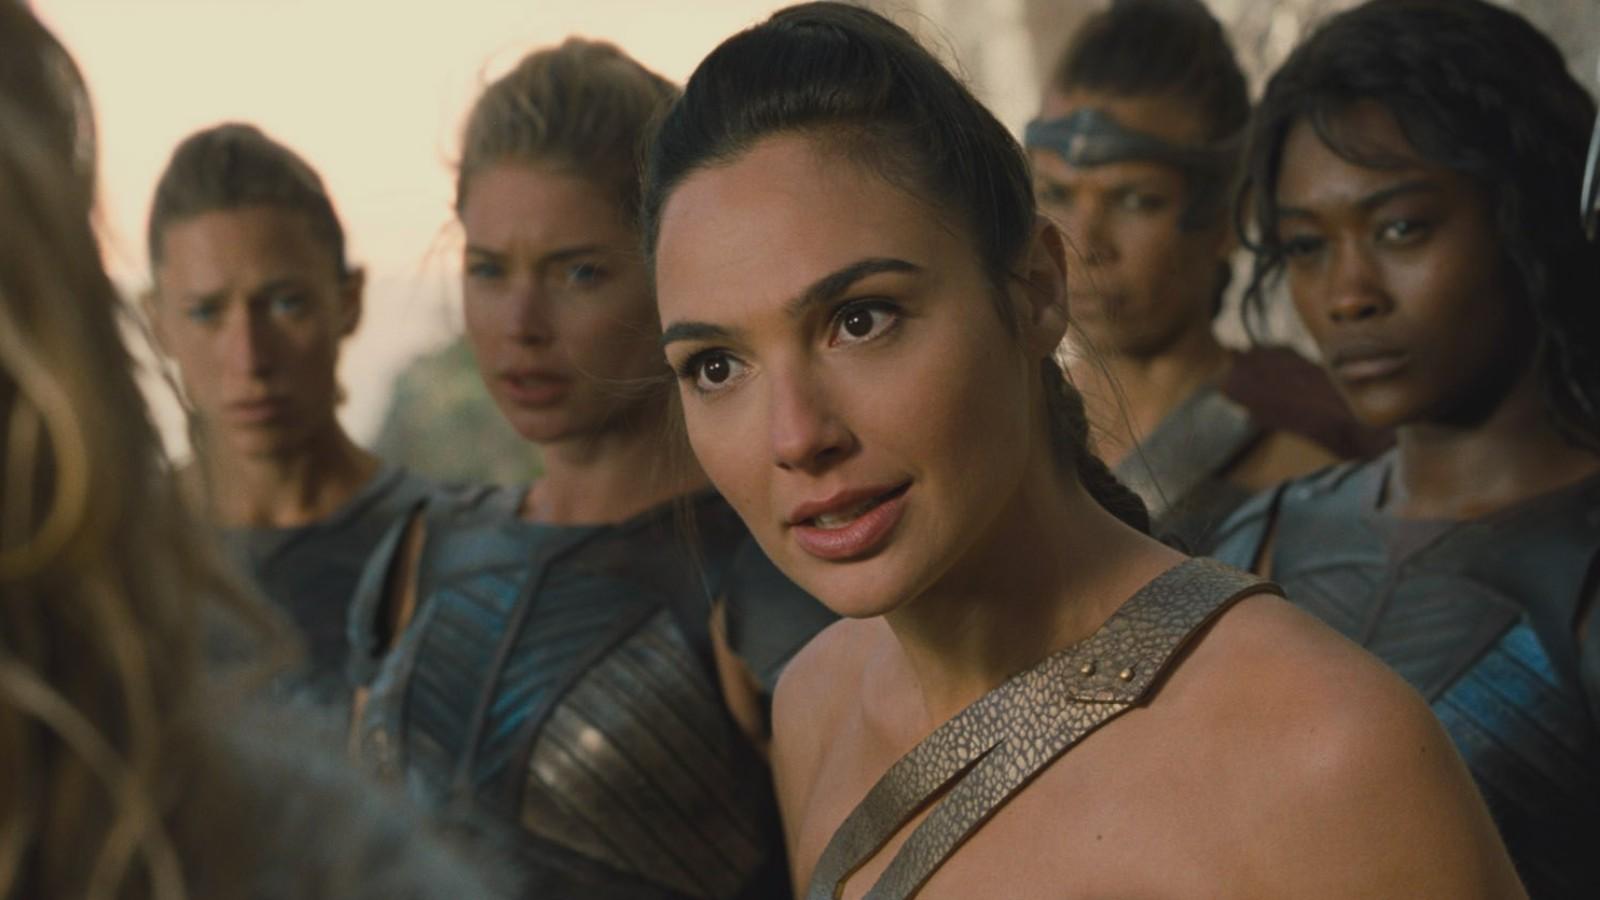 Wonder Woman in Themyscira